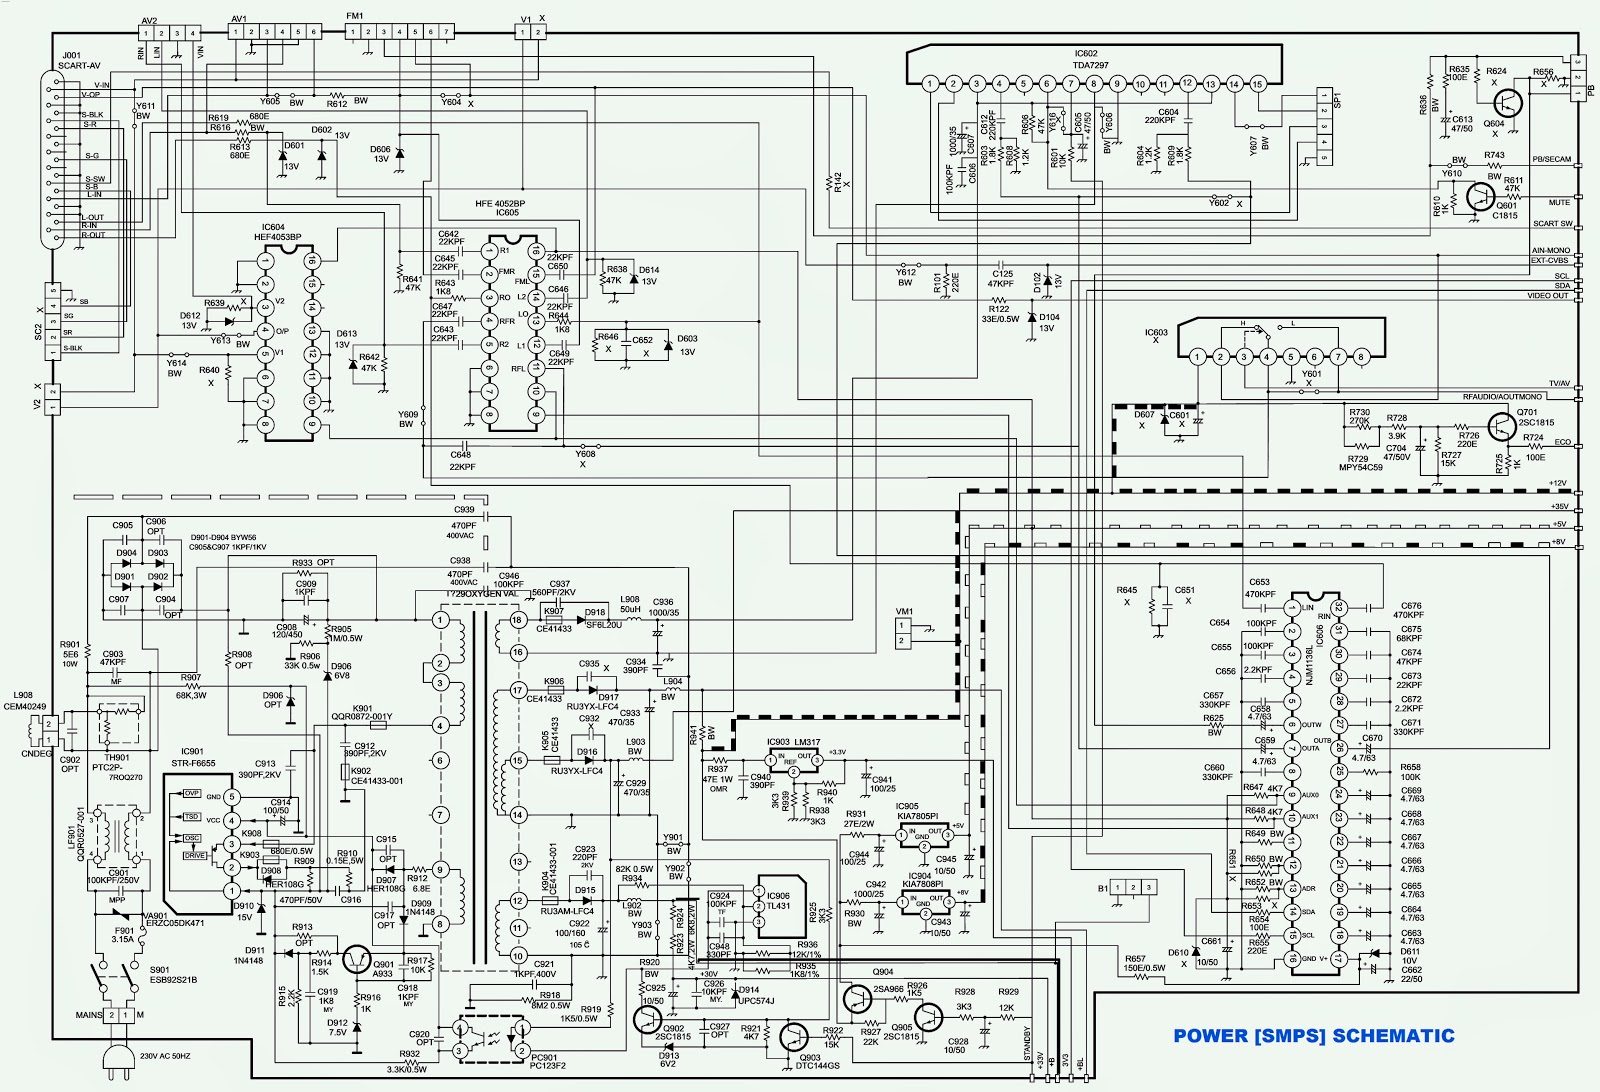 Atx 450w Smps Circuit Diagram 66 Mustang Alternator Wiring Power Supply Schematic Electro Help Onida 21 29 Oxygen Thunder Ctv Schematics Diagrams